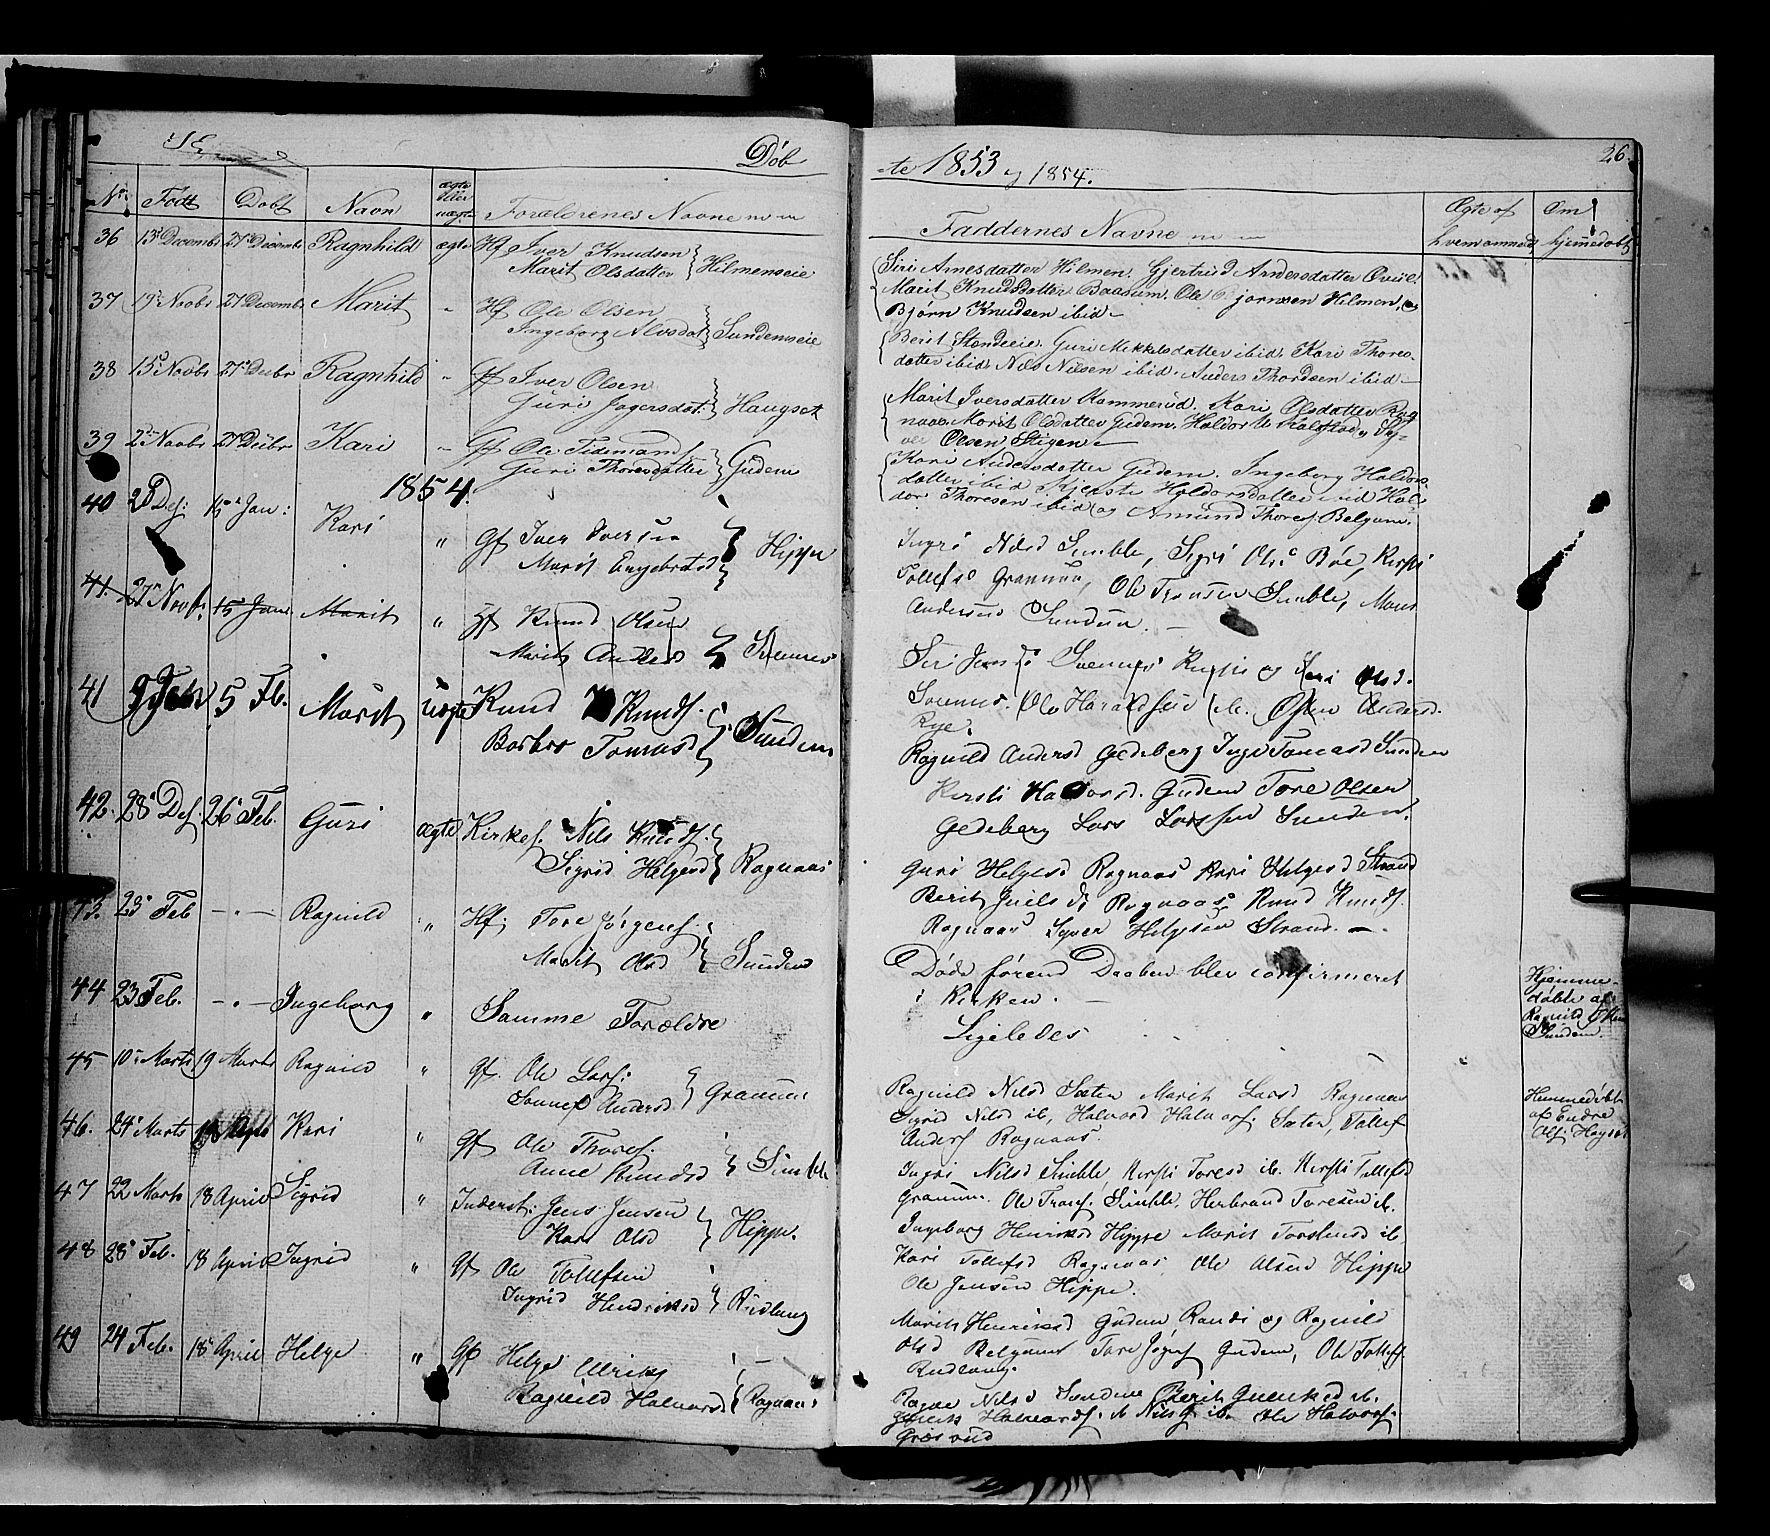 SAH, Nord-Aurdal prestekontor, Ministerialbok nr. 6, 1842-1863, s. 26